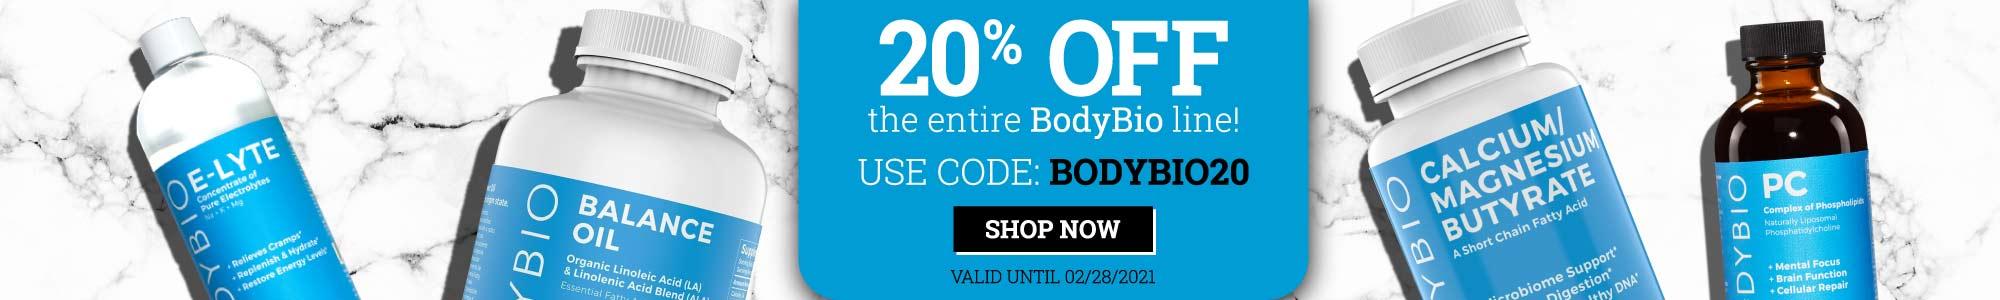 20% off entire BodyBio line. Use Coupon code: bodybio20 Shop now. Valid until 02/28/2021.